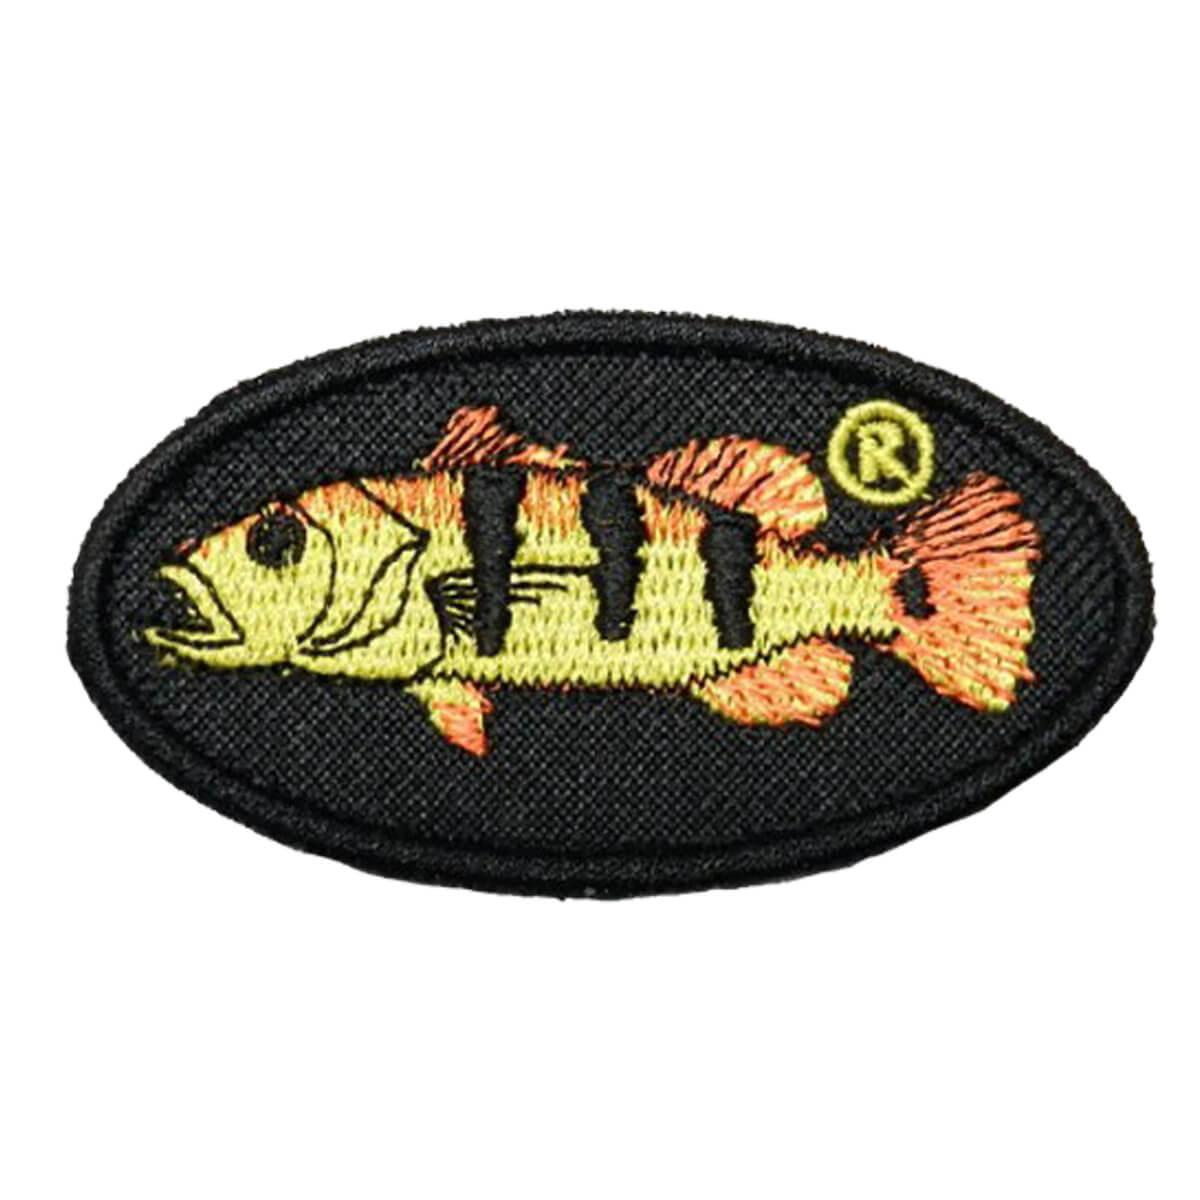 Bordado p/ Roupa Pet Tucunaré  - Pró Pesca Shop